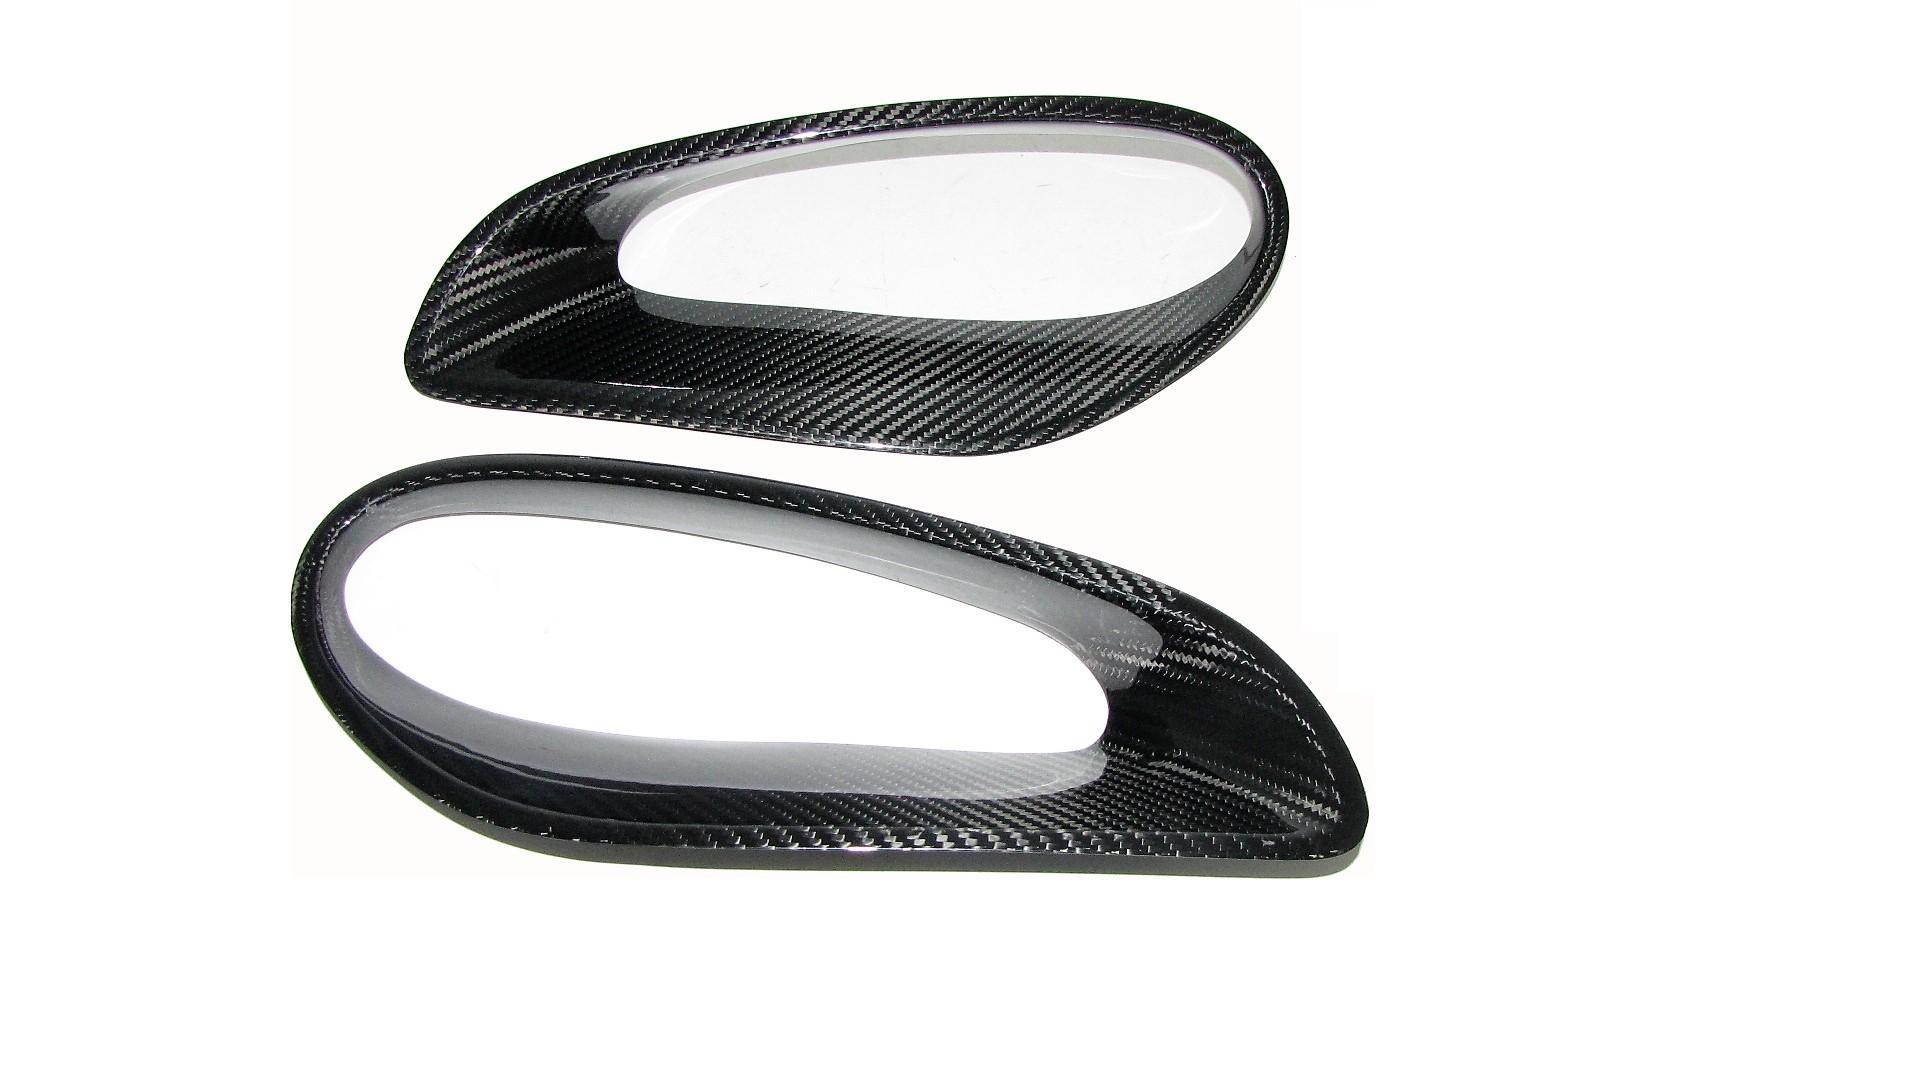 Für Porsche 991.2 991.1 Turbo 911 Carbon Ram Air Cover